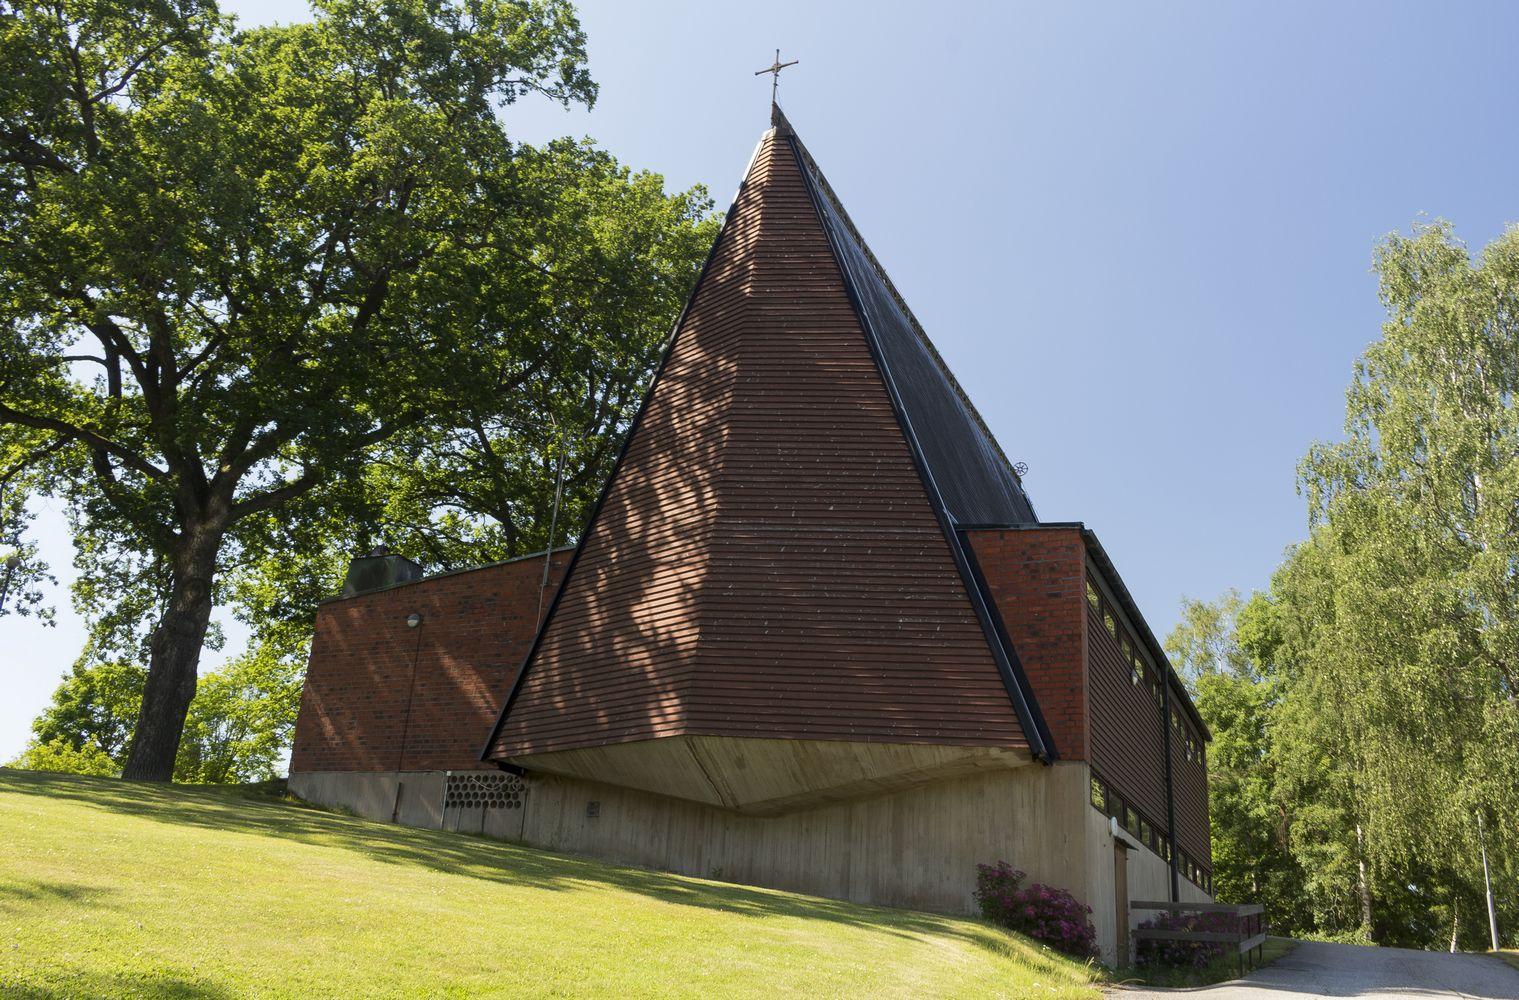 Valla kyrka. Foto: Oksana Verkhola